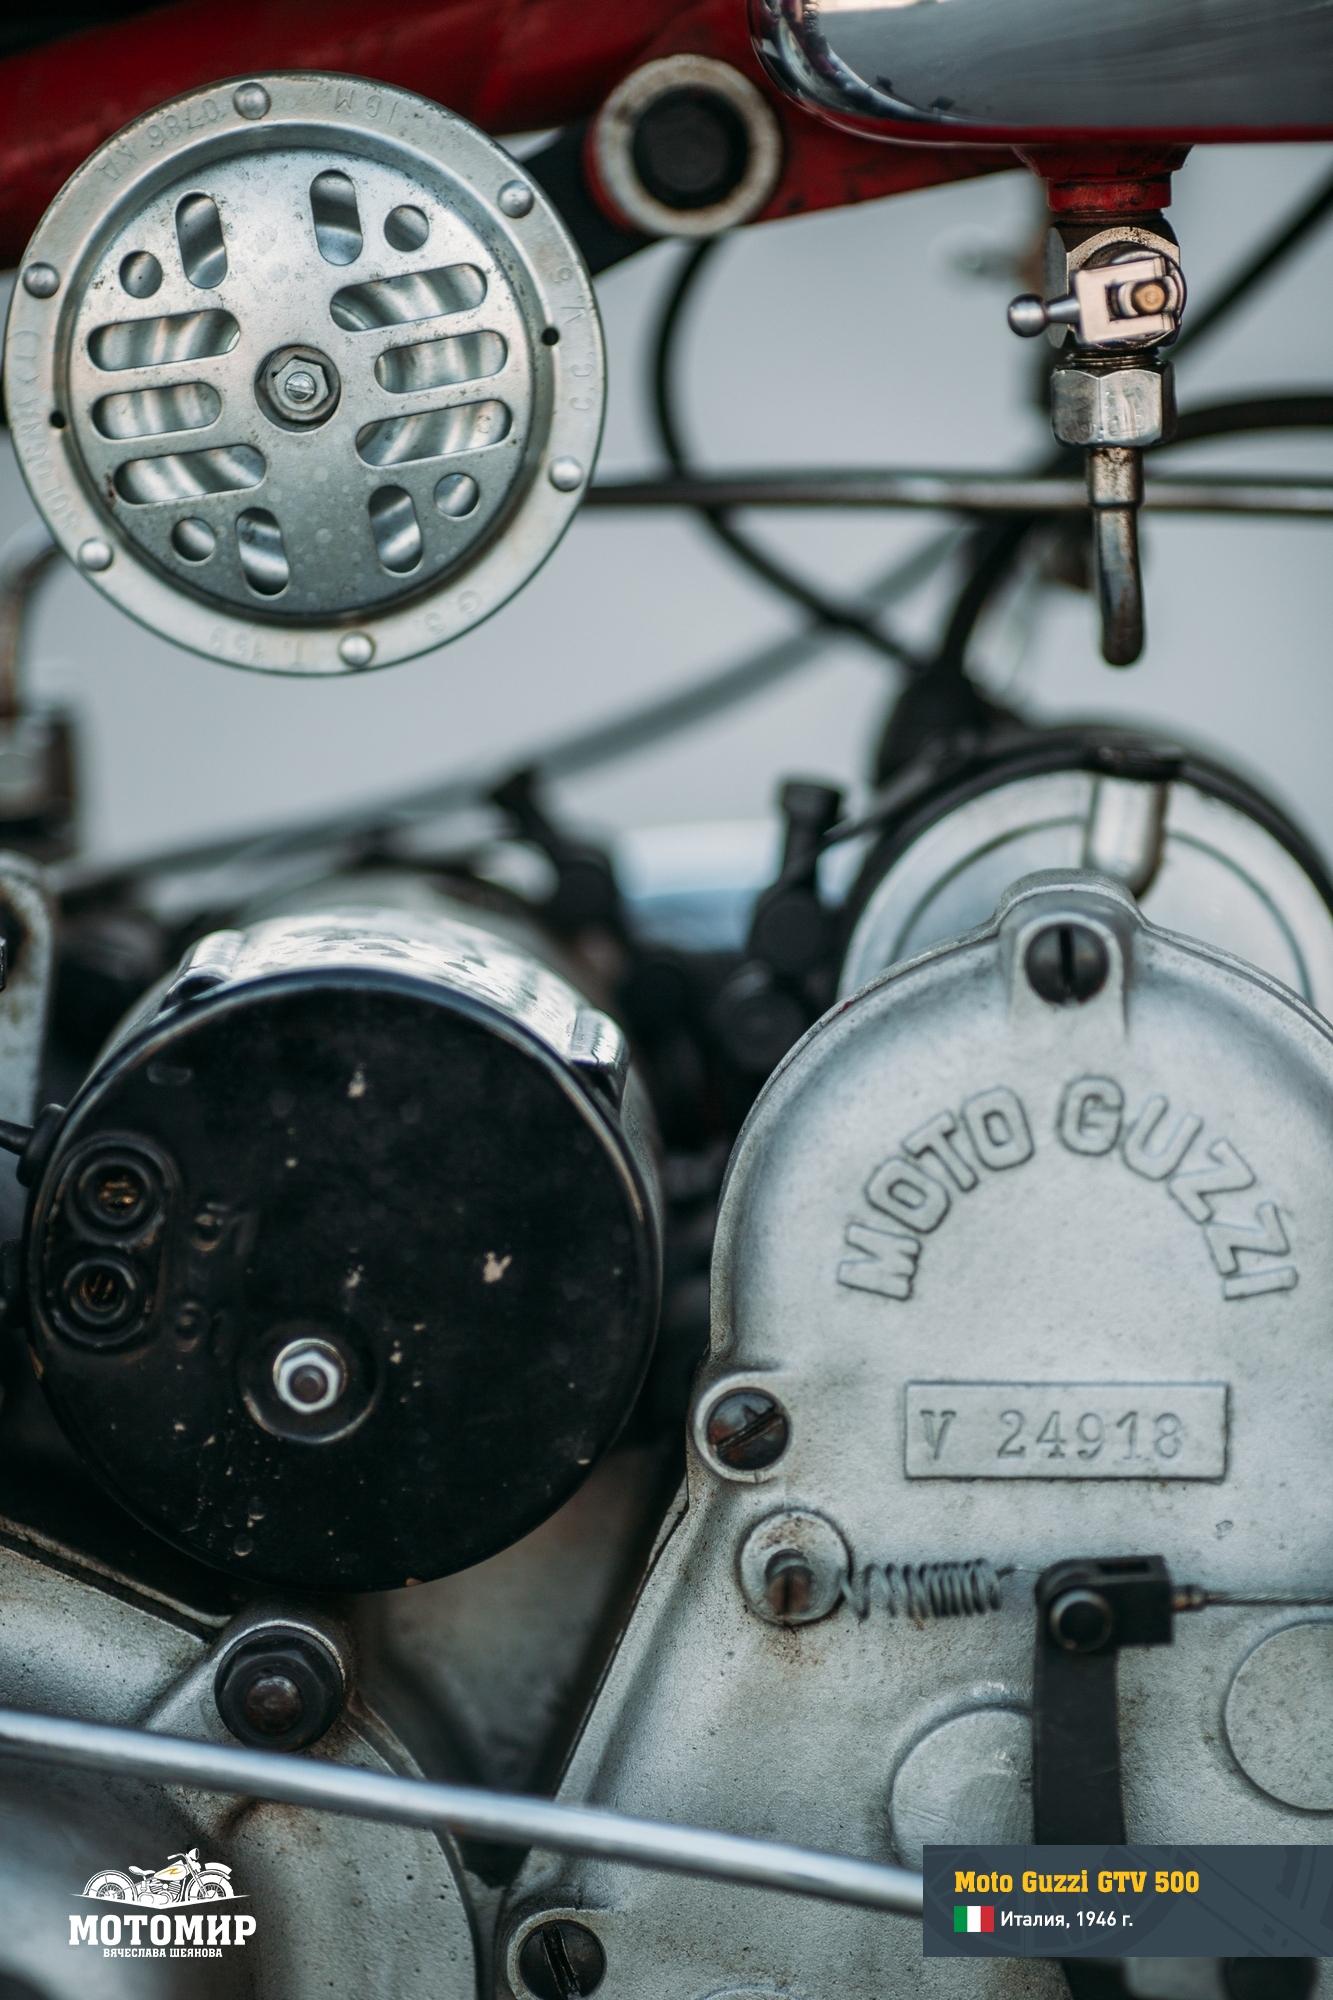 moto-guzzi-gtv-500-201509-web-11